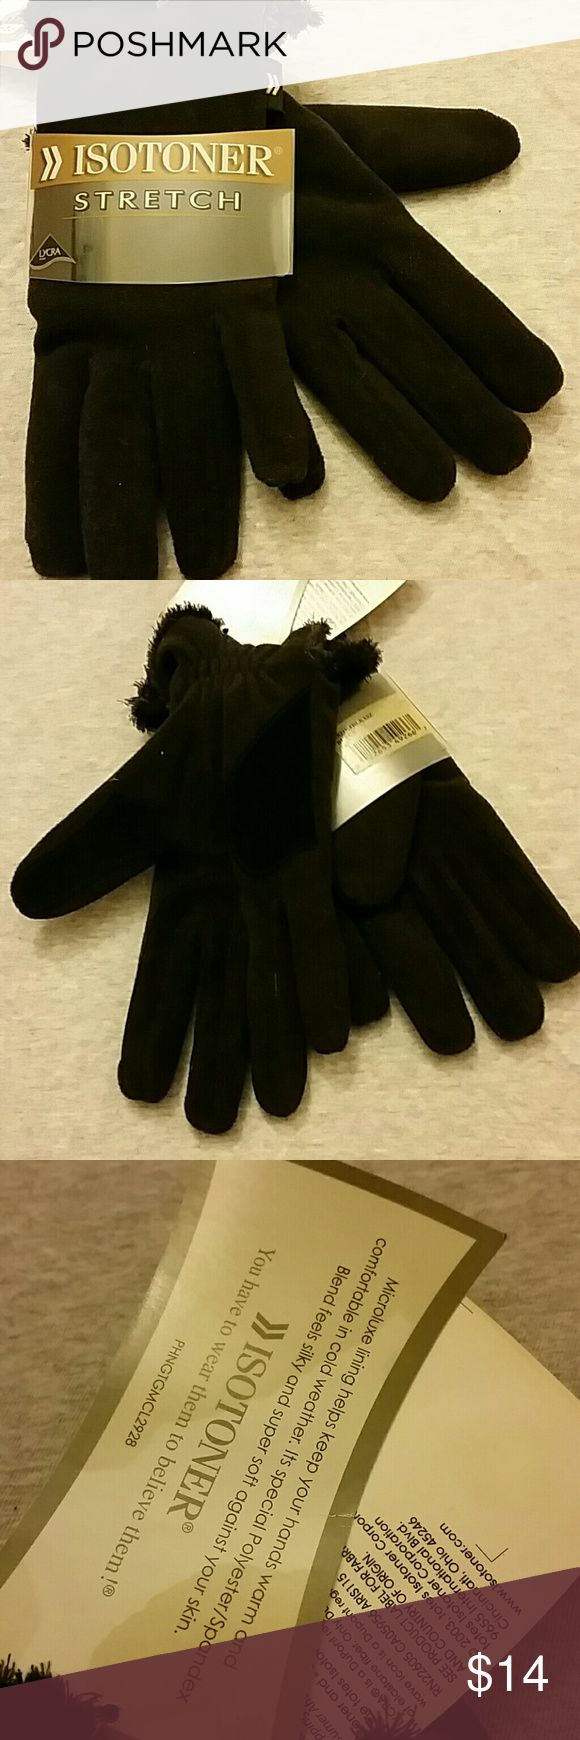 Mens gloves old navy - Isotoner Fleece Gloves Bnwt Advanced Spandex With Lycra Blend Soft Warm Microfiber Fleece